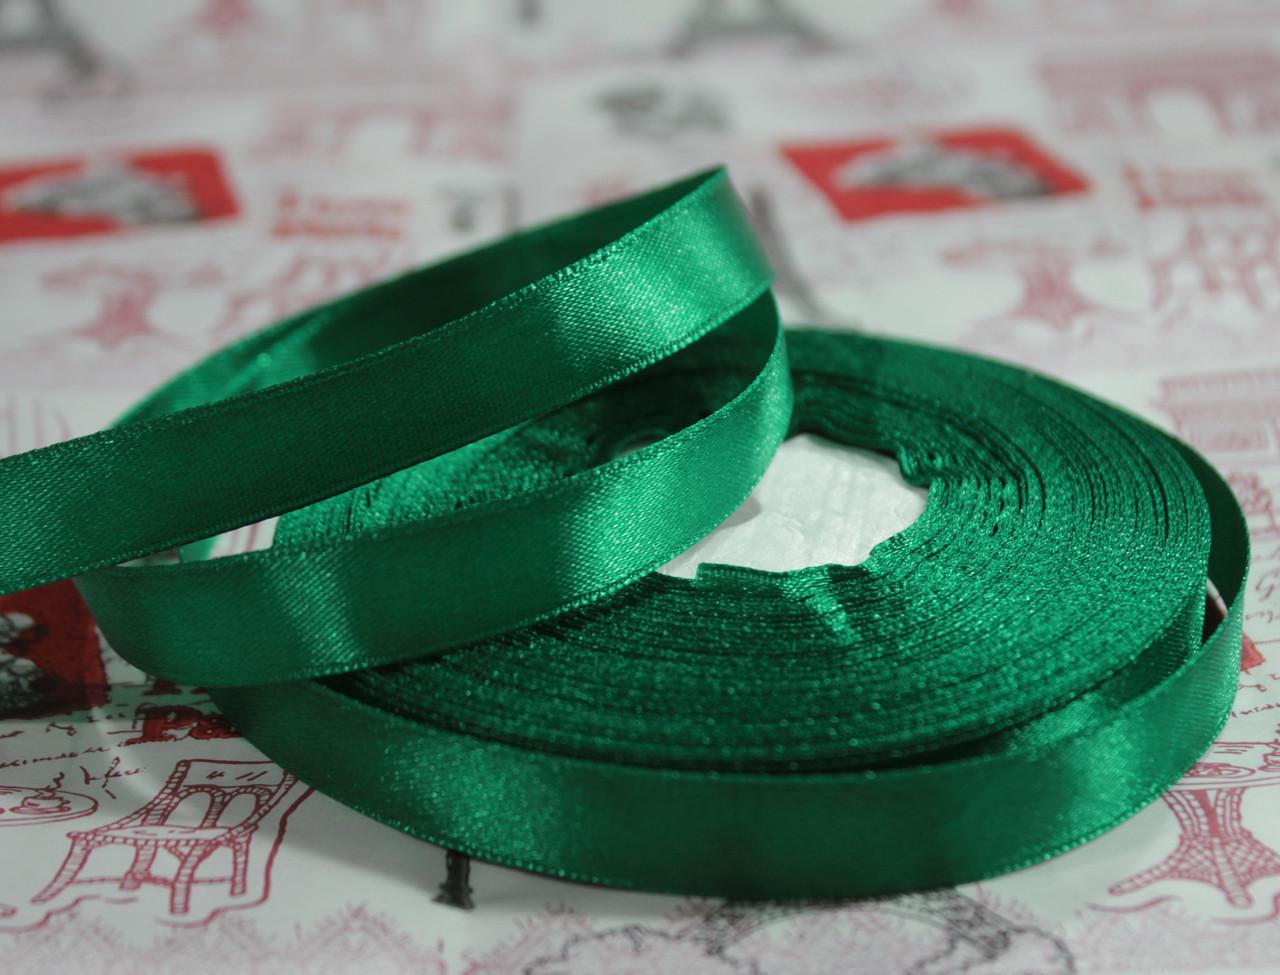 Лента атласная темно- зеленая 12,5 мм, моток 33 м.